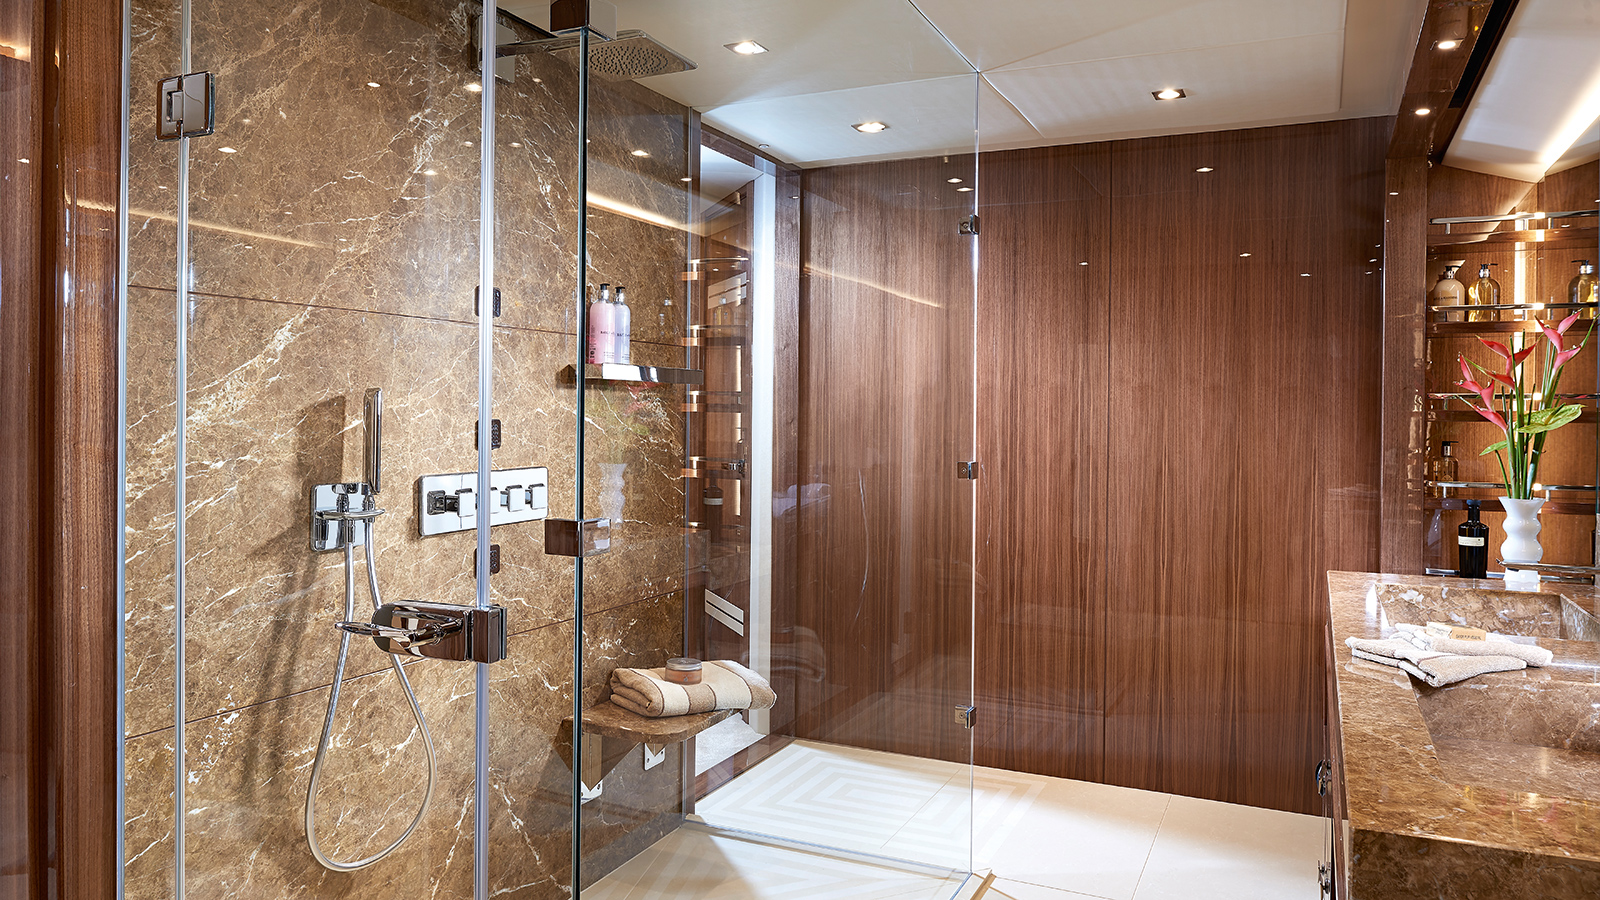 one-of-the-en-suite-bathrooms-on-sunseeker-131-yacht-zozo